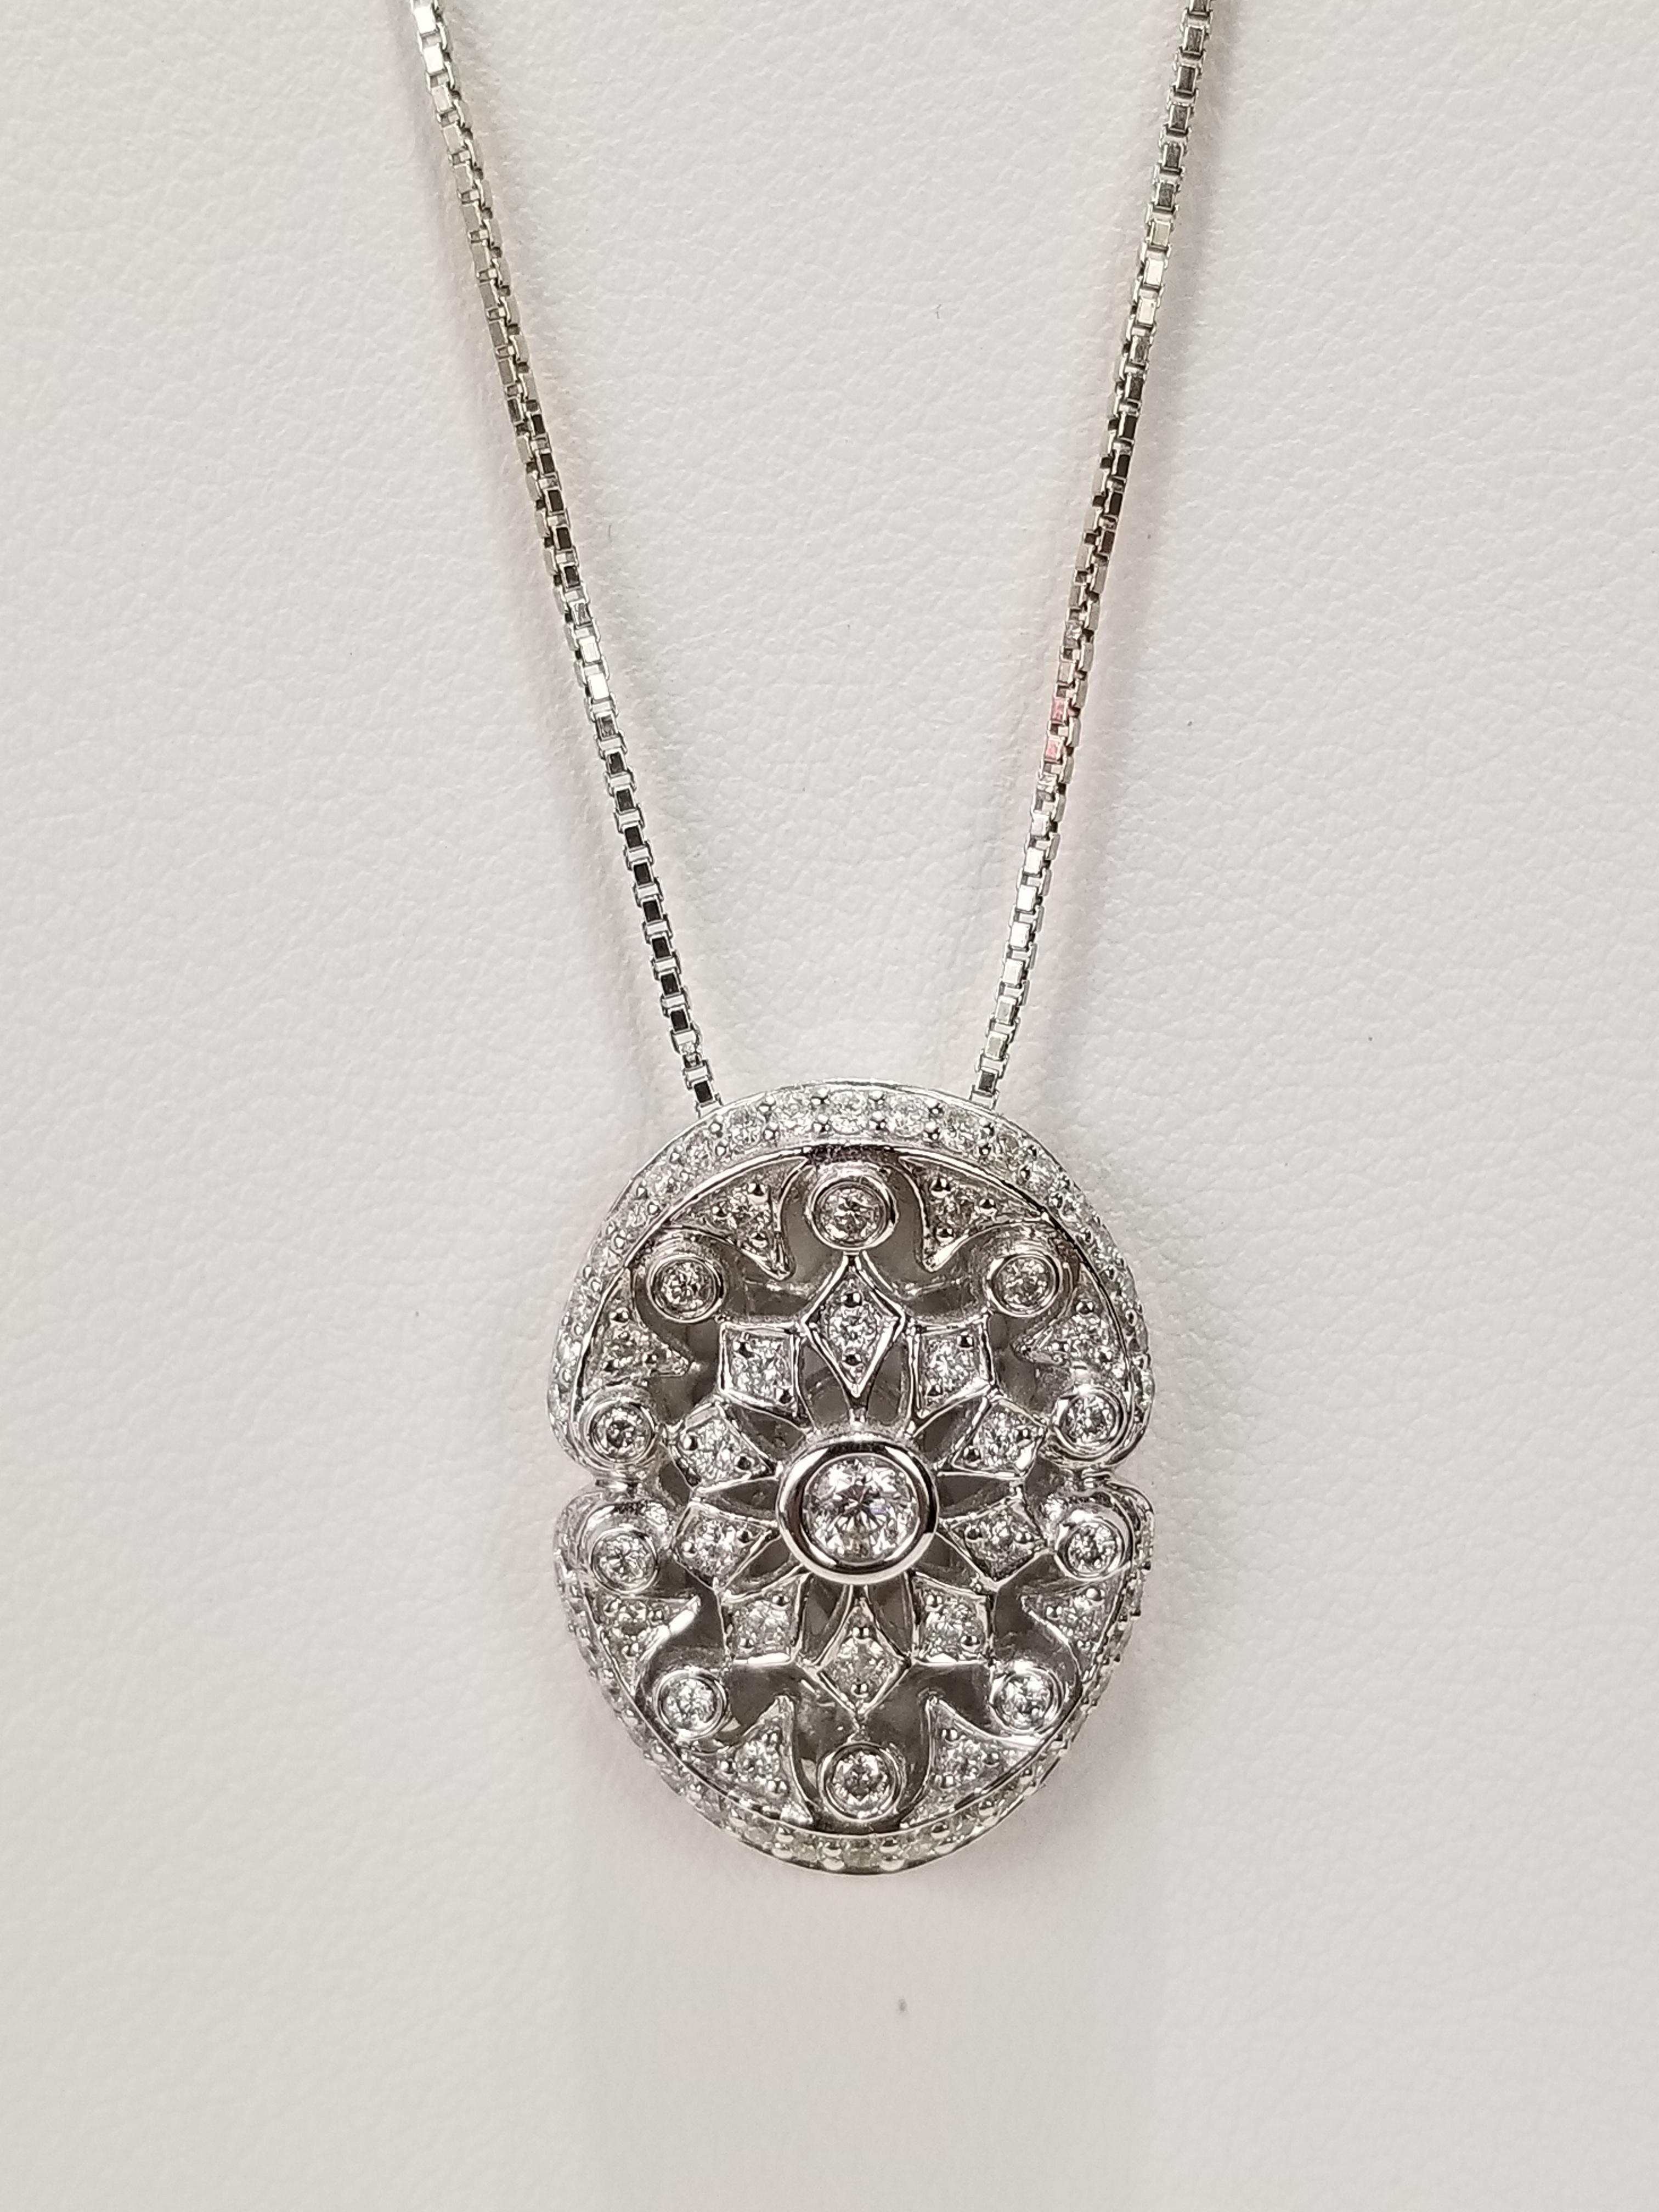 14K White Gold Diamonds 0.69ct Regular Price $3625 SALE $995 Ref HM615